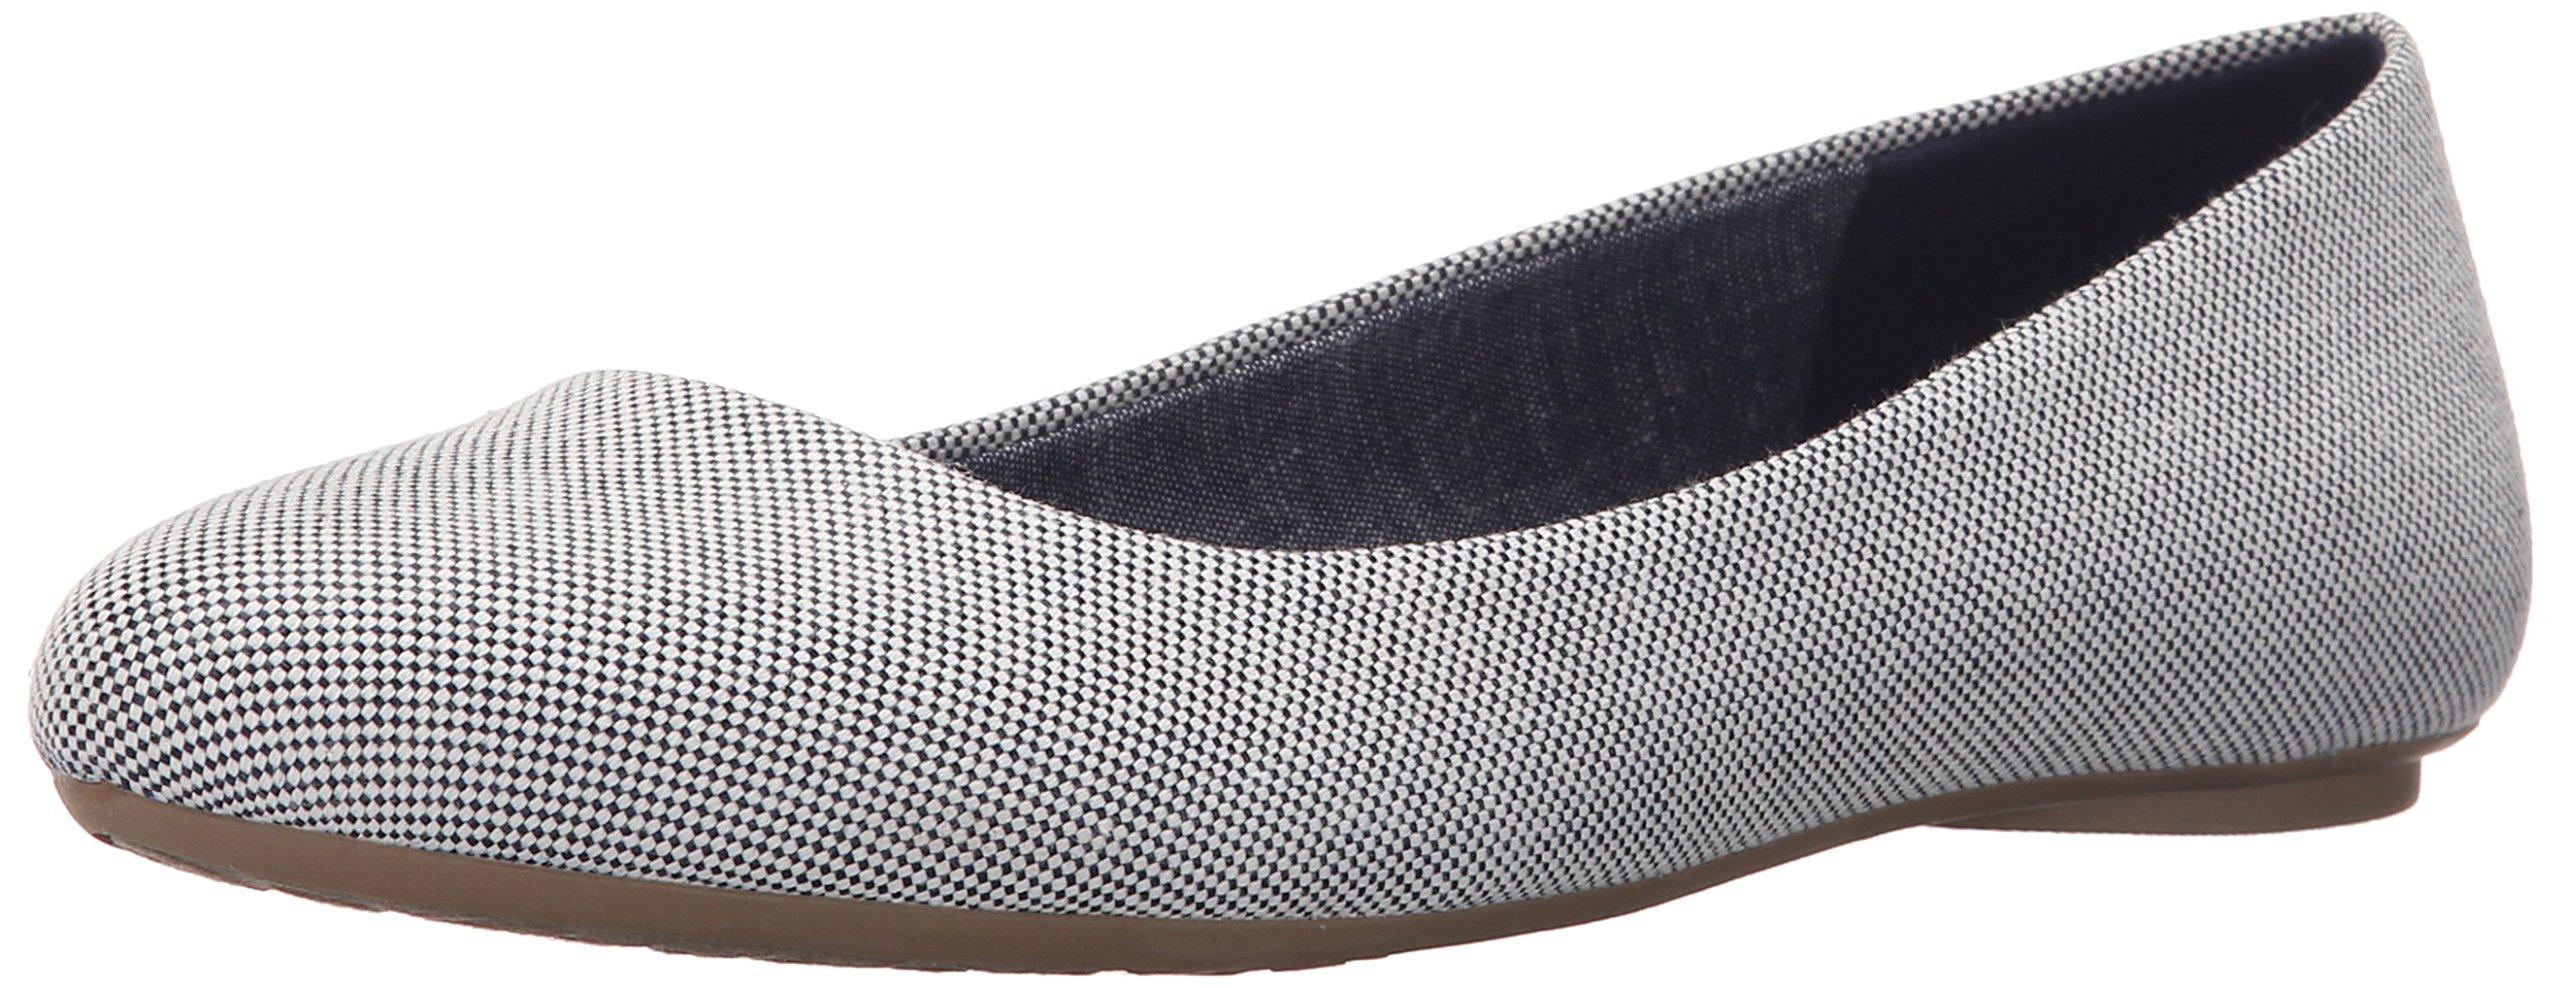 Dr. Scholl's Women's Navy/Gardenia Beach Bag Flat  Shoes - 7 B(M) US